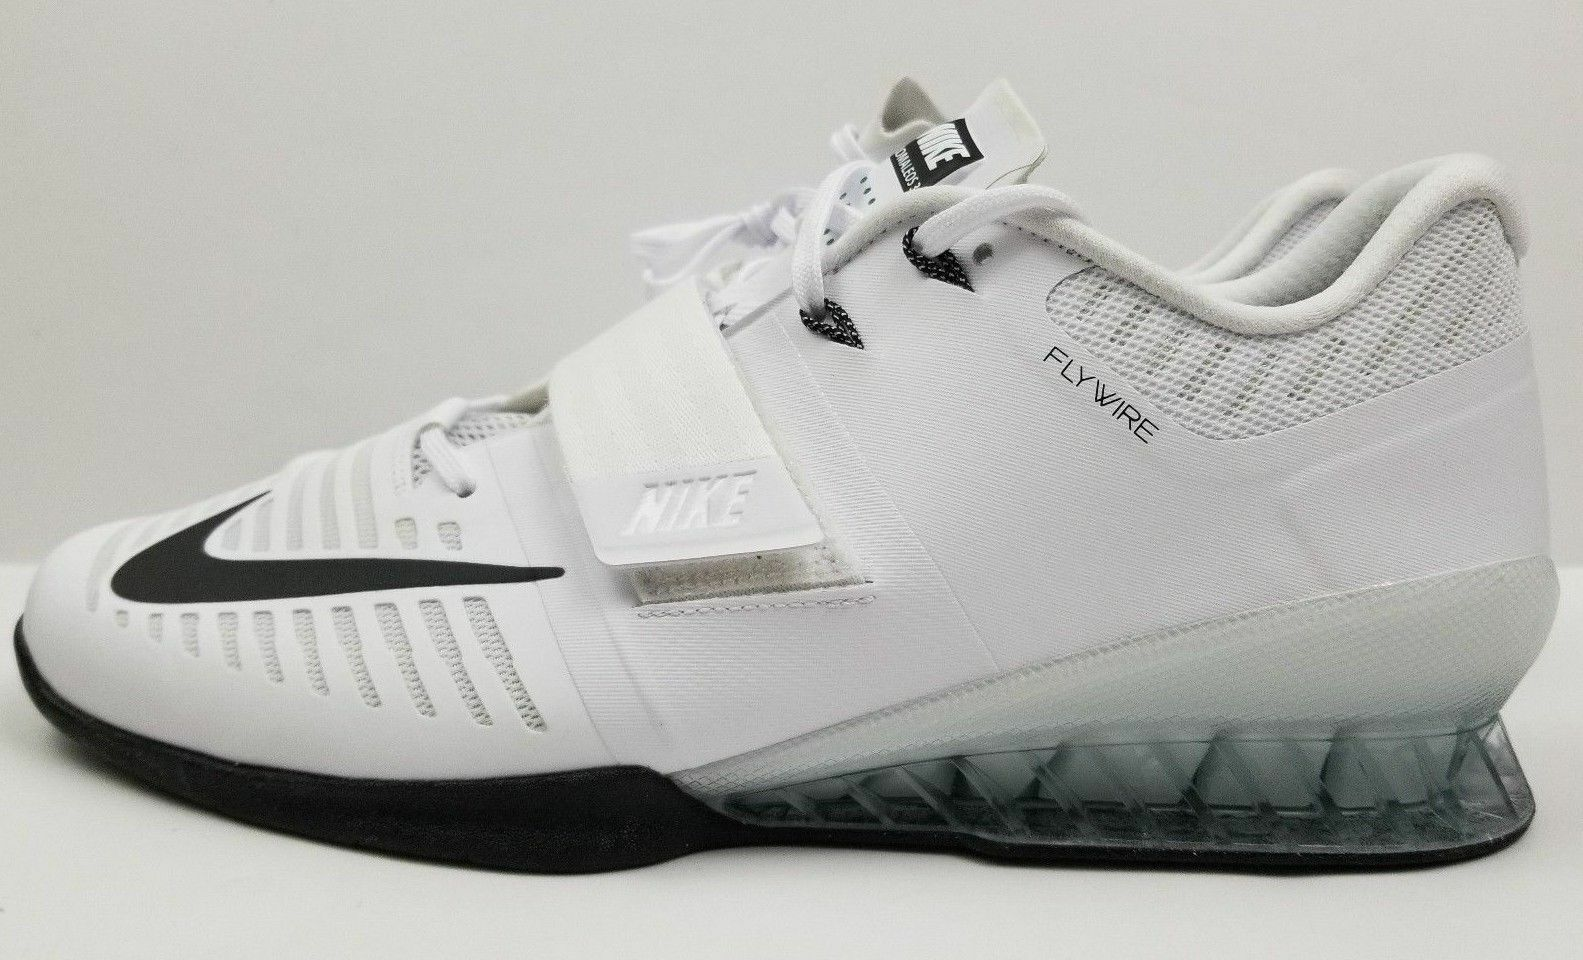 Nike Romaleos 3 Weightlifting Training shoes Men's White Black 852933-100 Sz 14